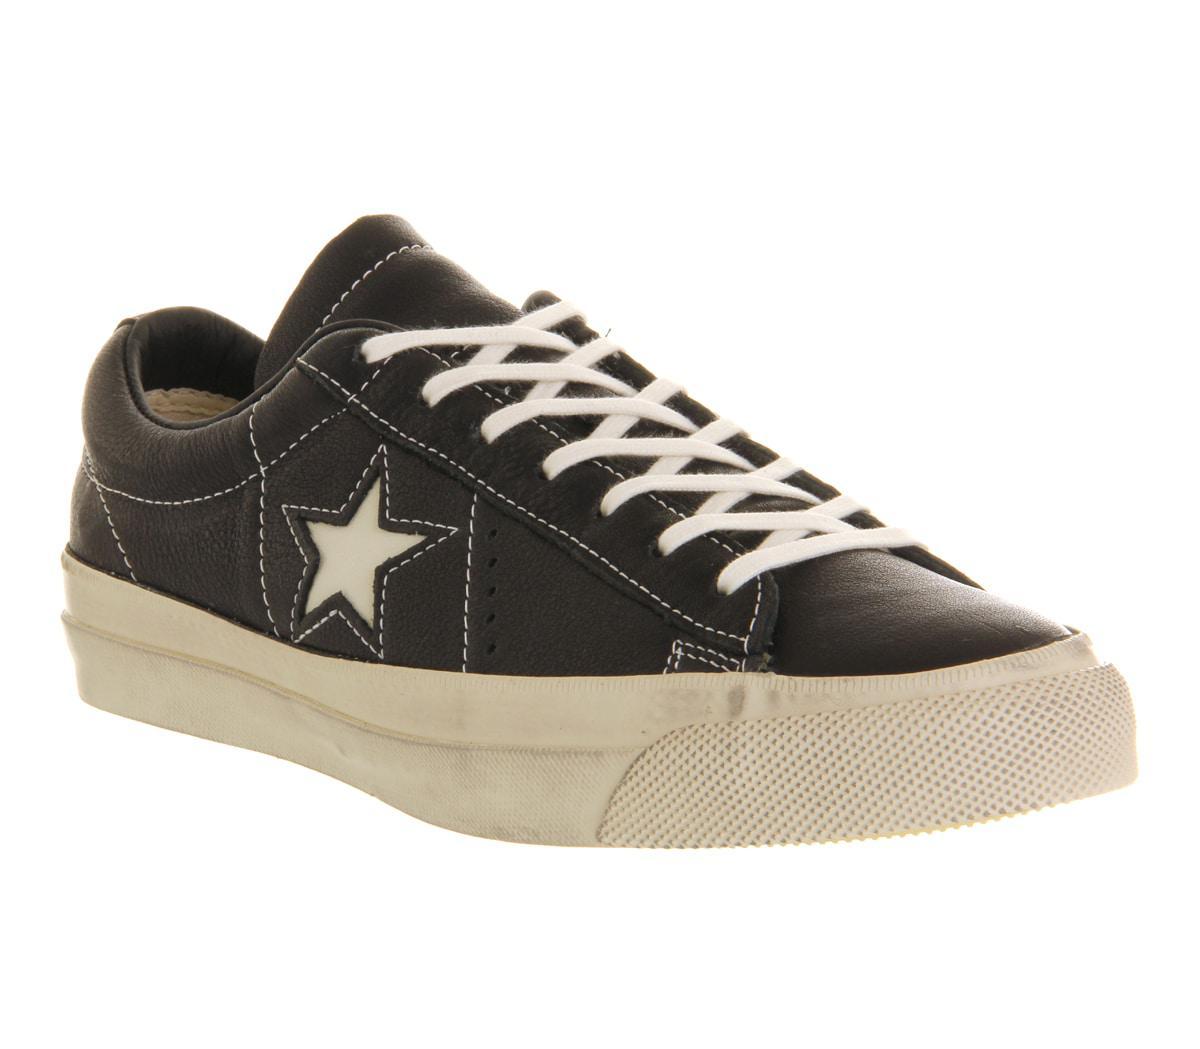 842dcf16e7ee2b Lyst - Converse John Varvatos One Star in Black